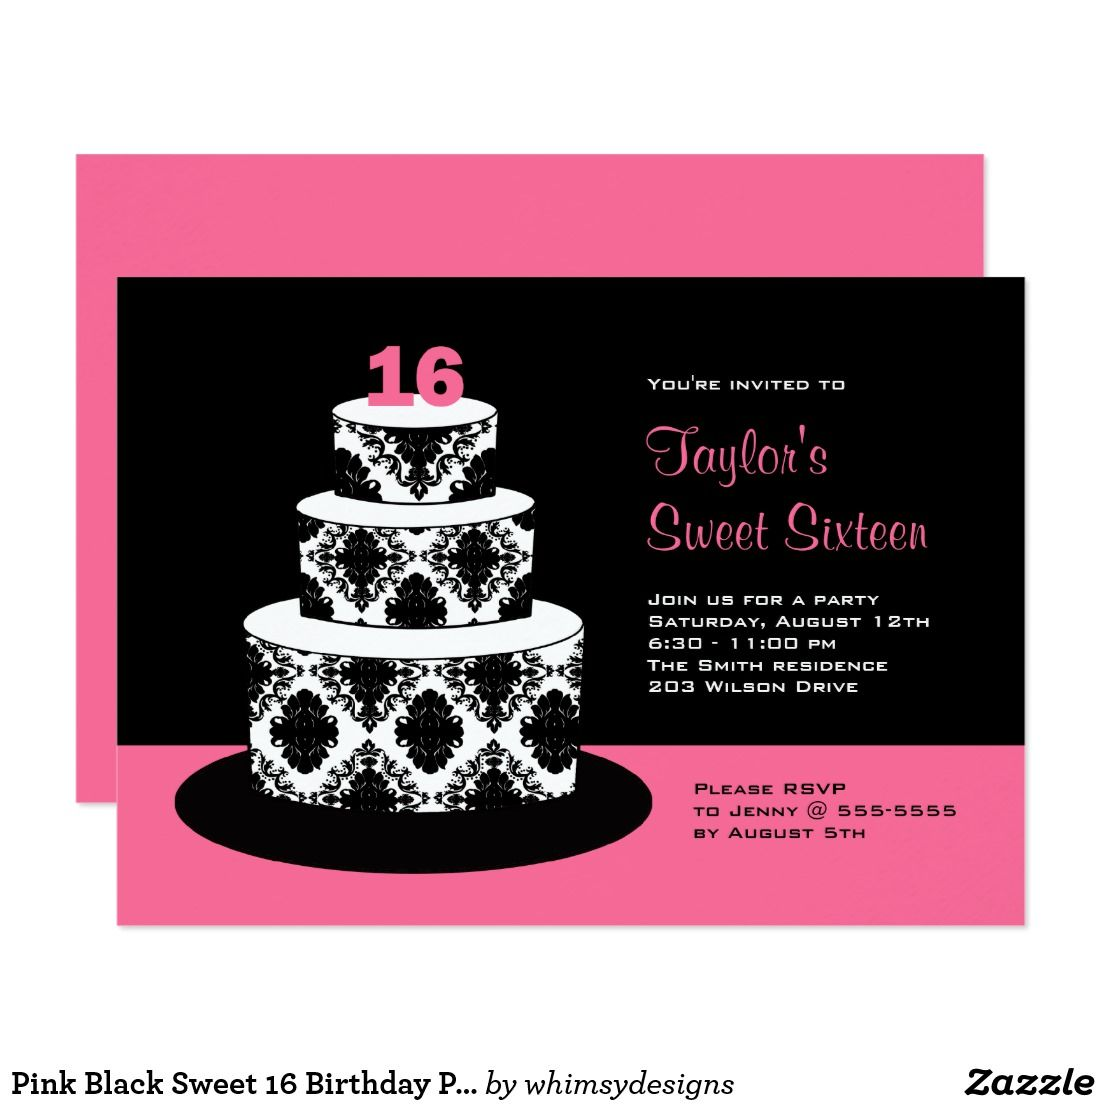 Pink Black Sweet 16 Birthday Party Invitations | Birthday sweets ...